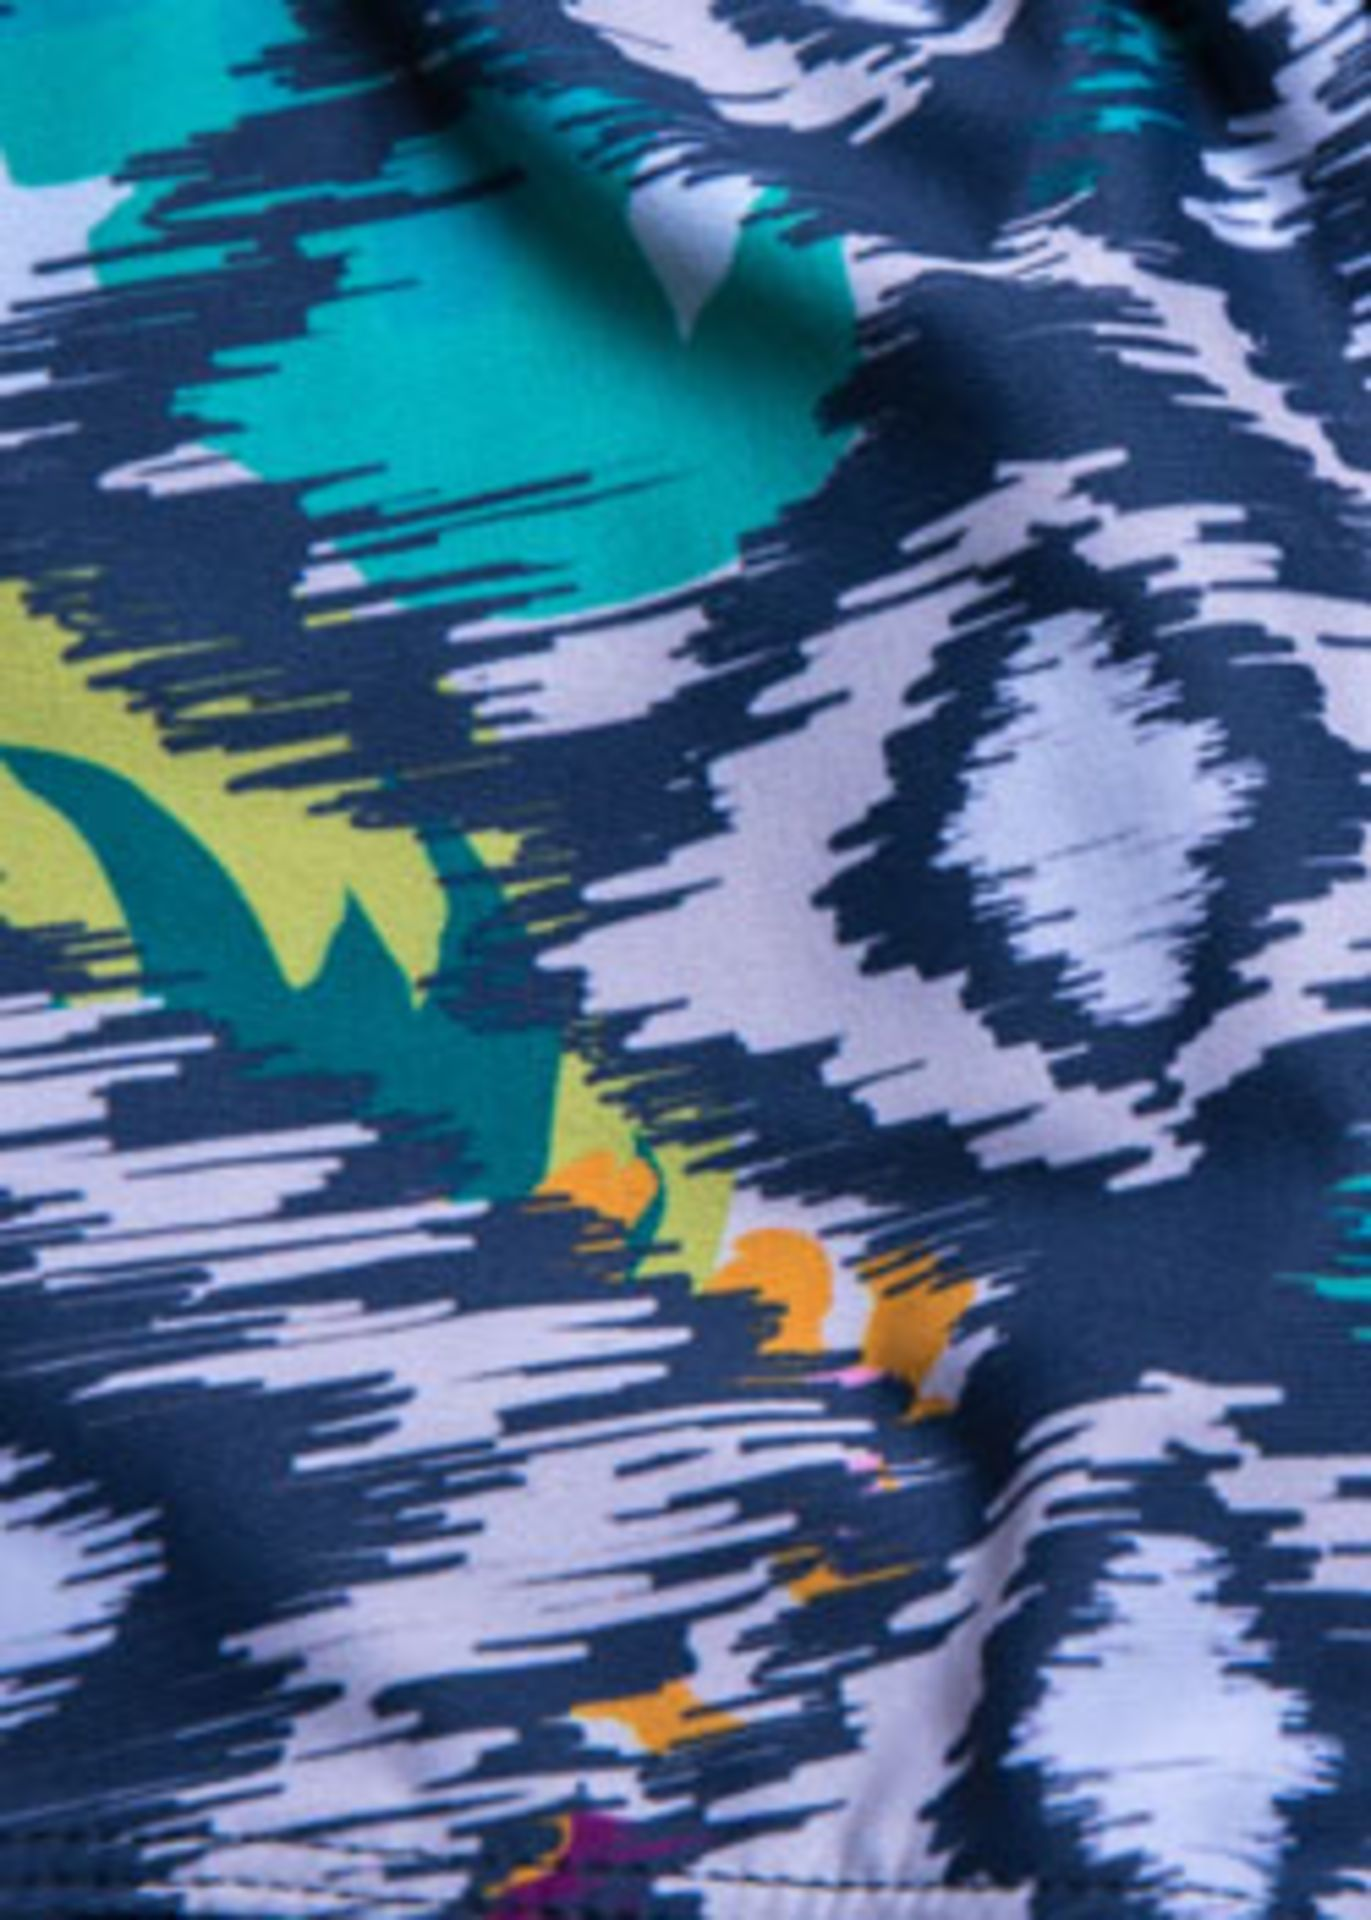 4 x Paraqeet Print Leggings | XS | 4 Designs - Image 6 of 8